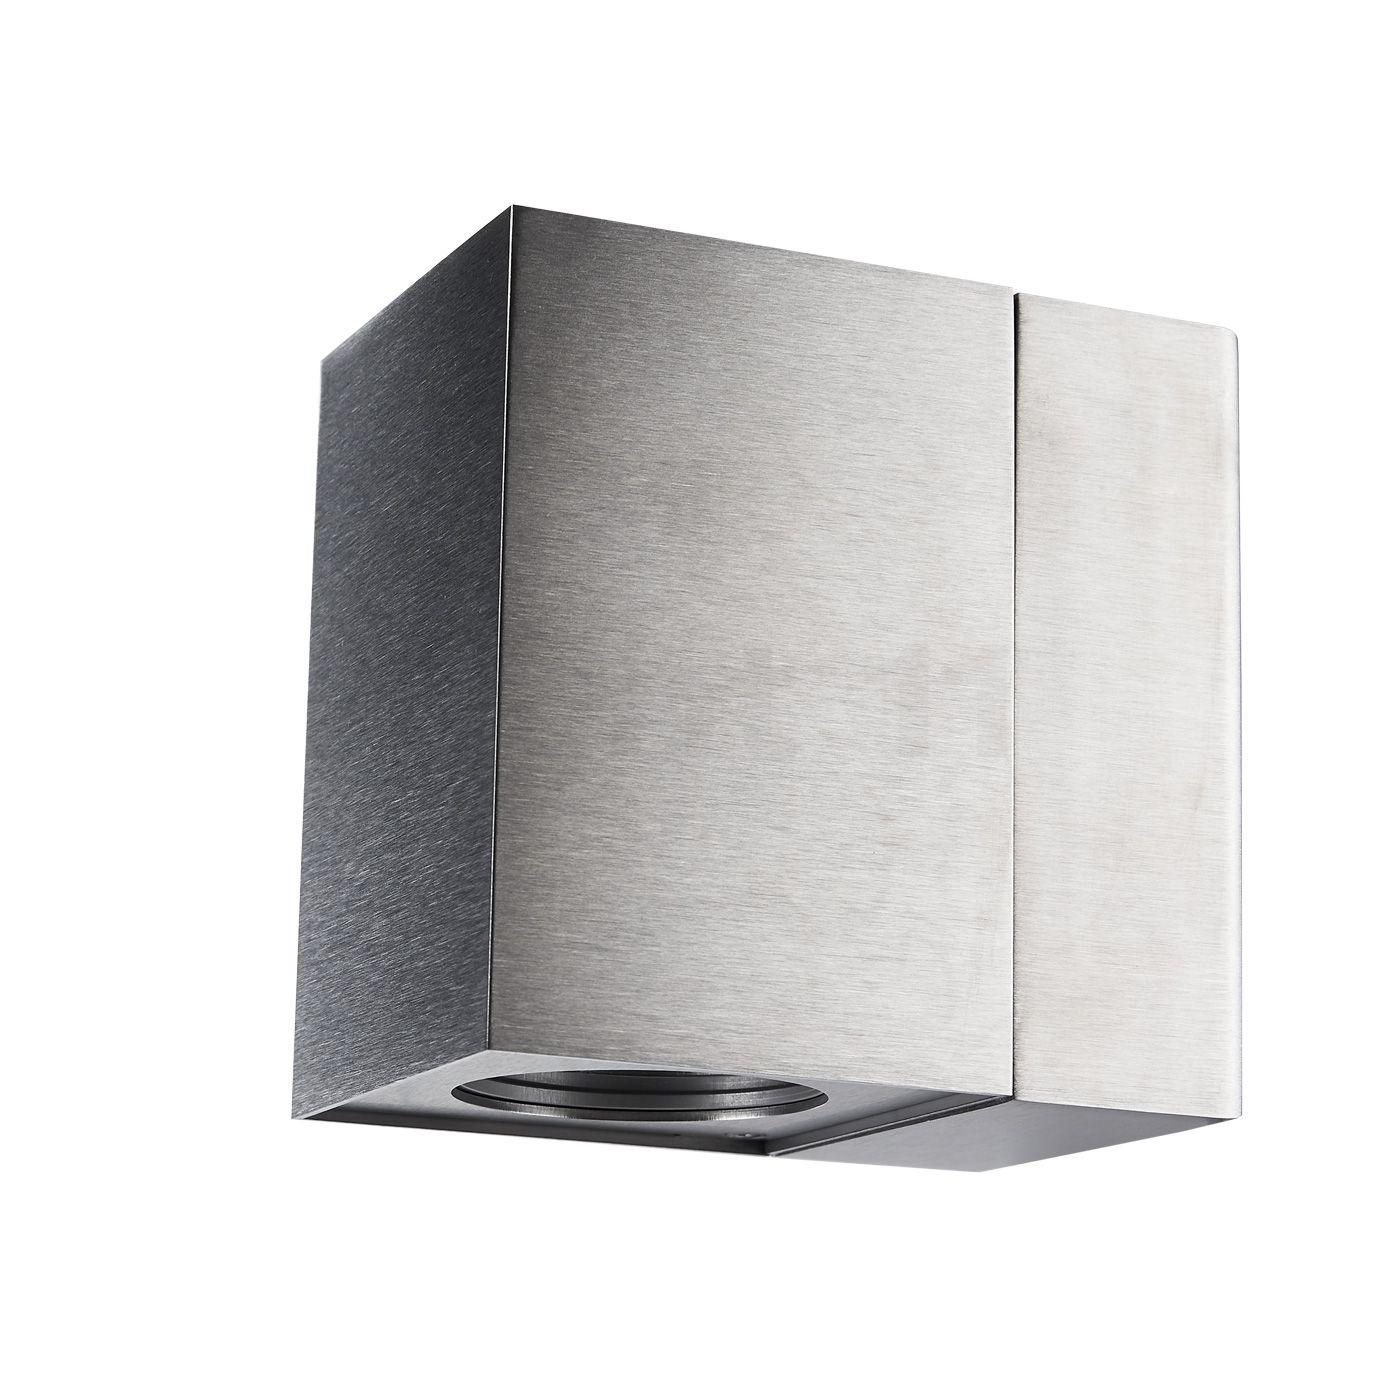 quant led wandlamp kopen op. Black Bedroom Furniture Sets. Home Design Ideas